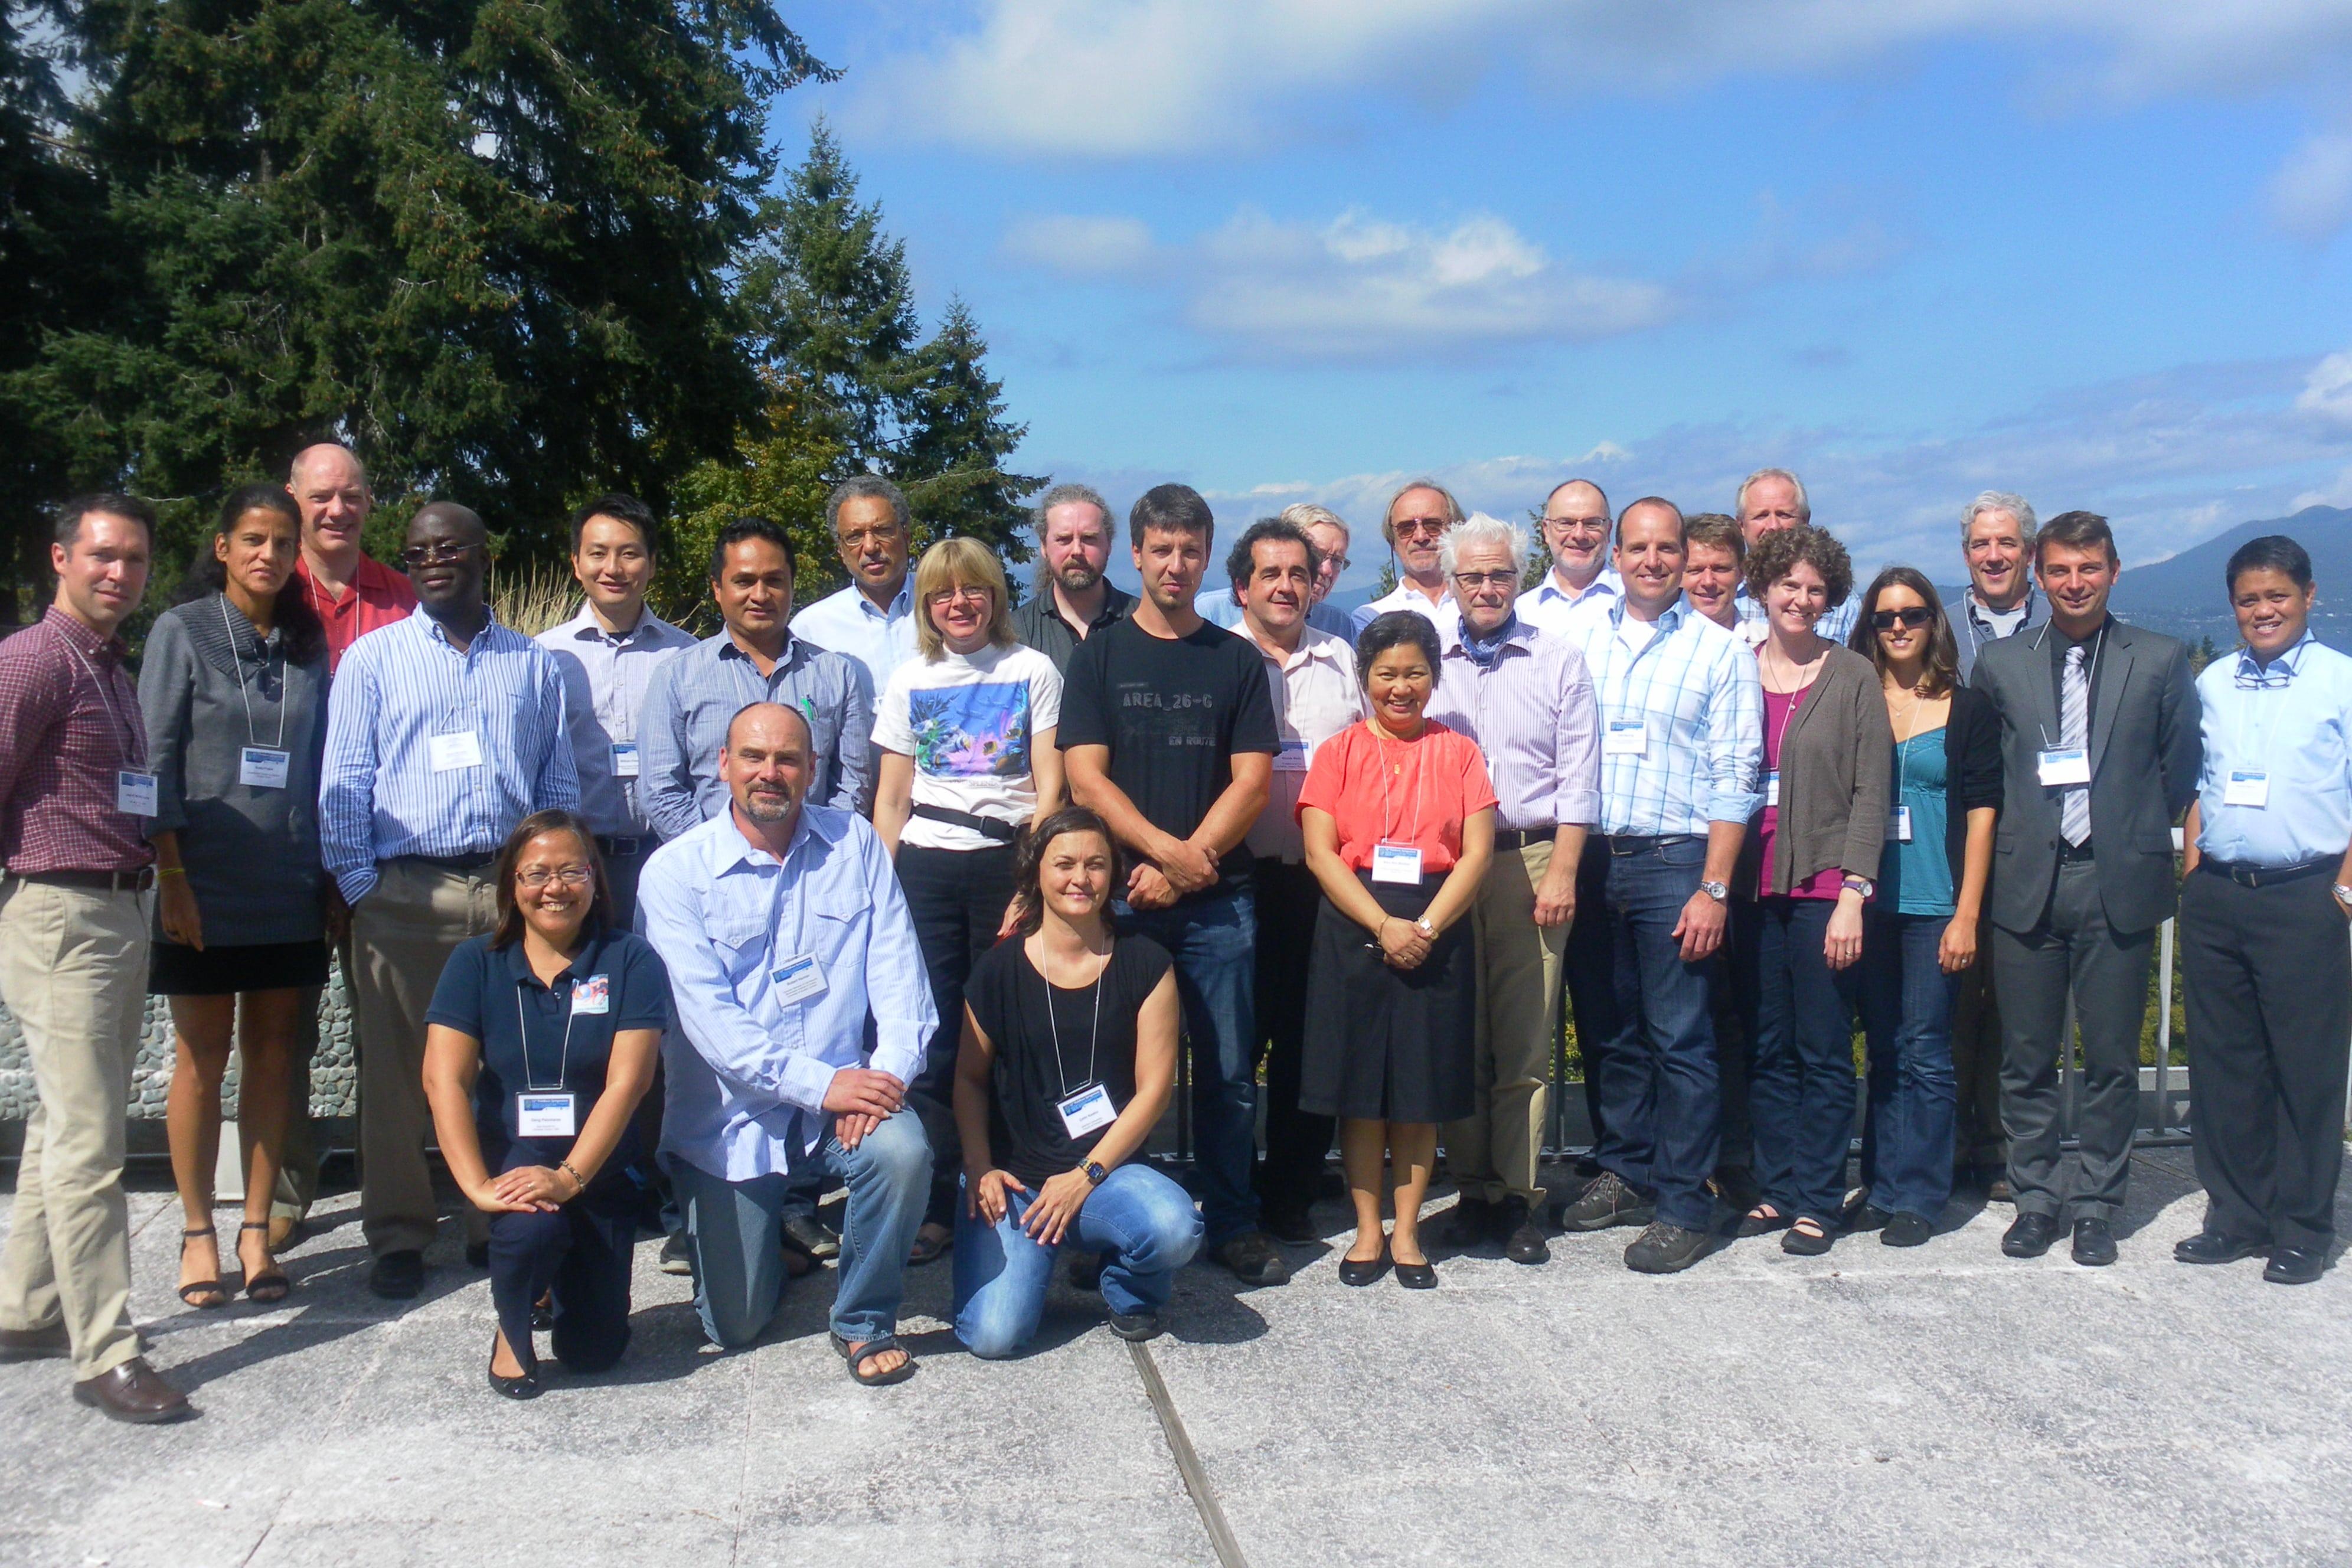 FishBase_Symposium_Vancouver_Sept_2014-min